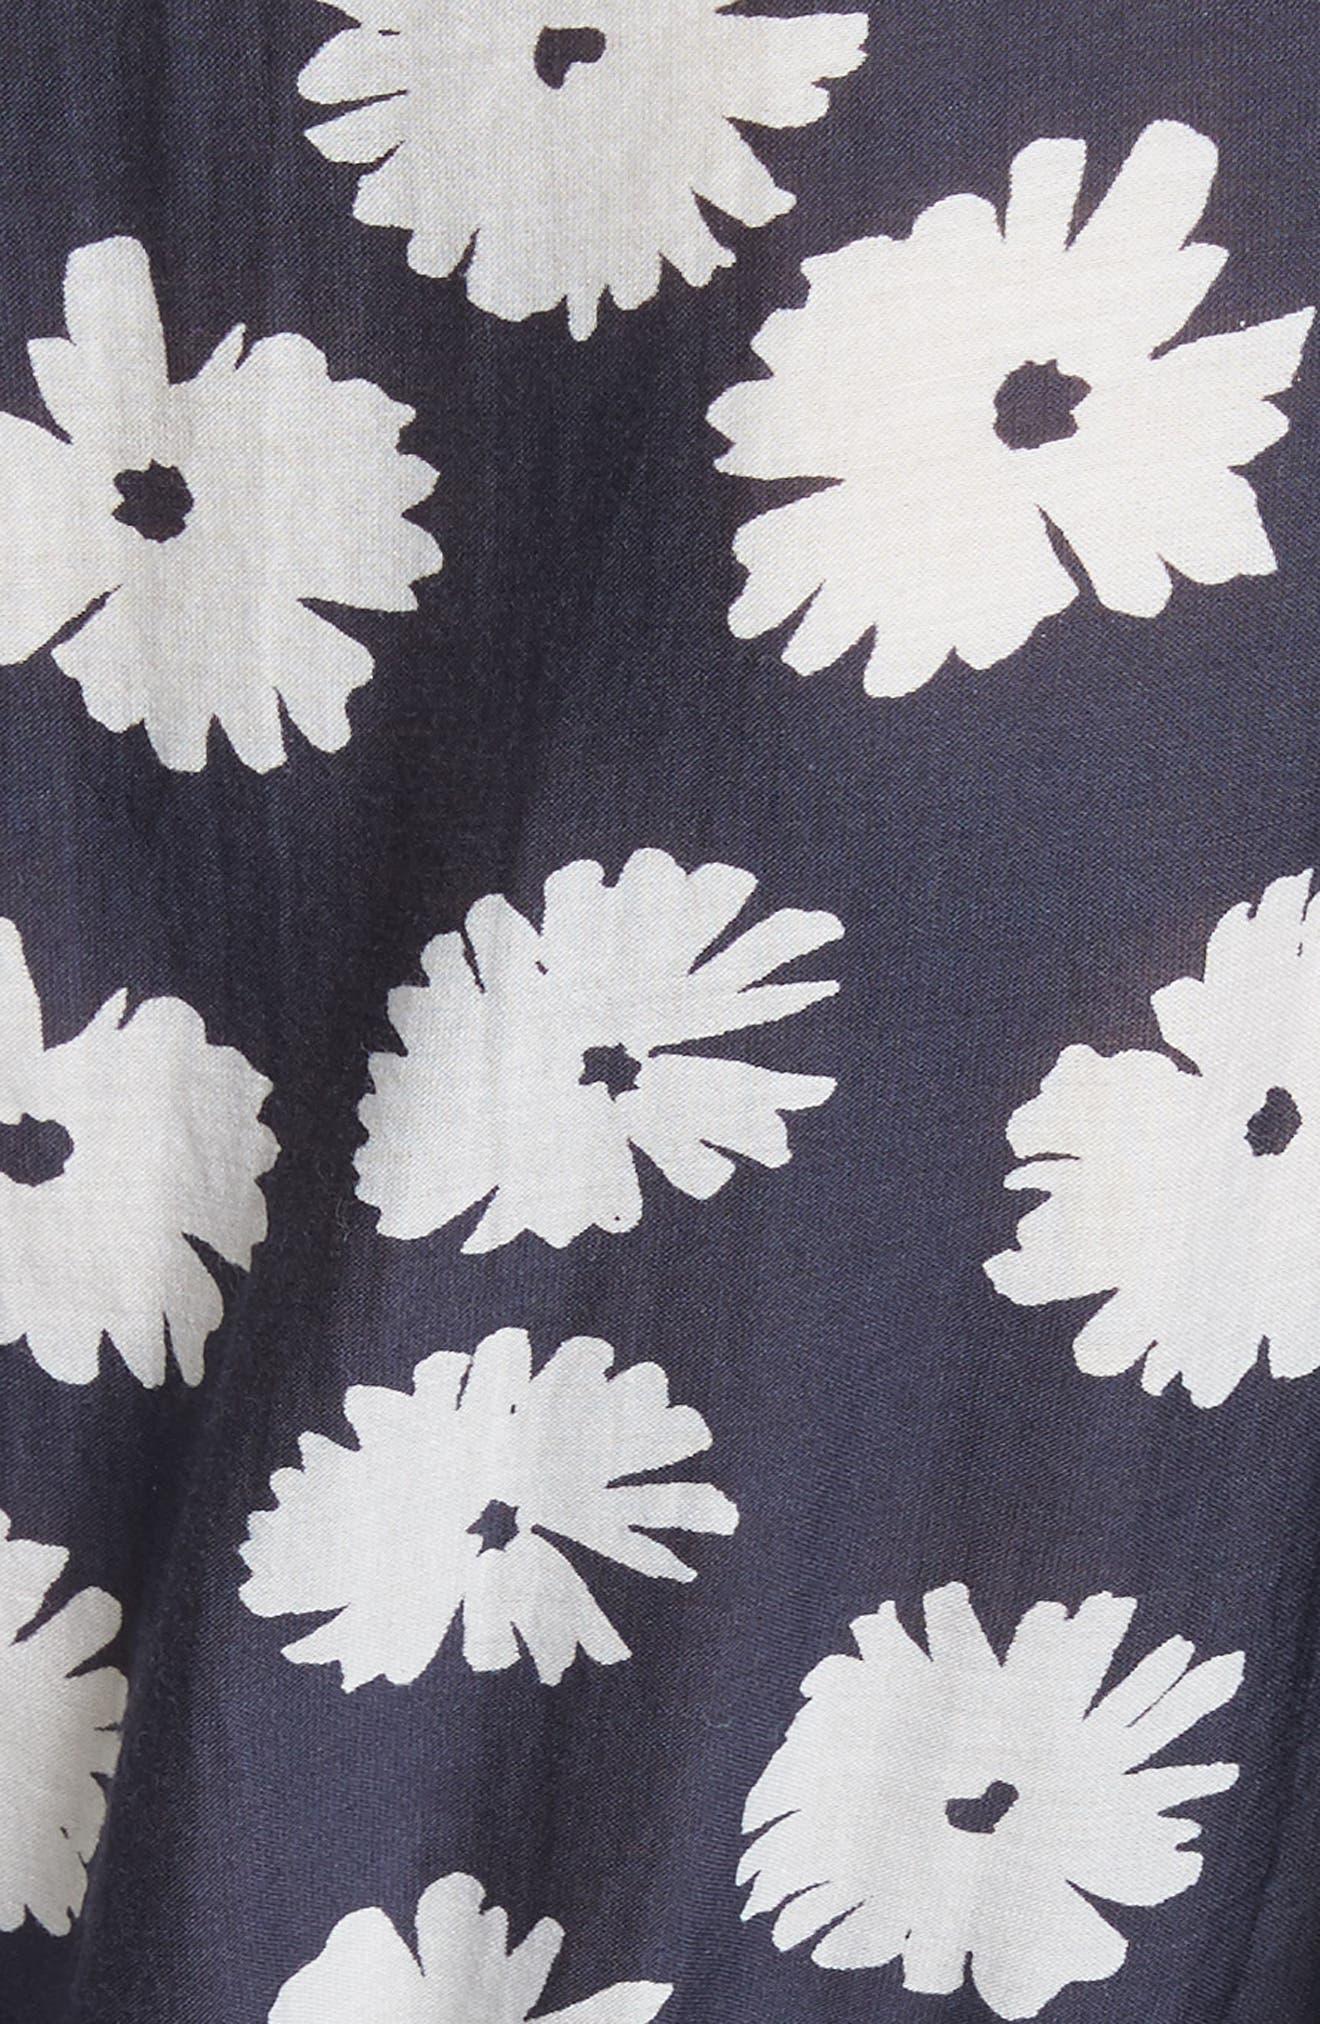 Bougainvillea Wrap Dress,                             Alternate thumbnail 5, color,                             Cypress Print